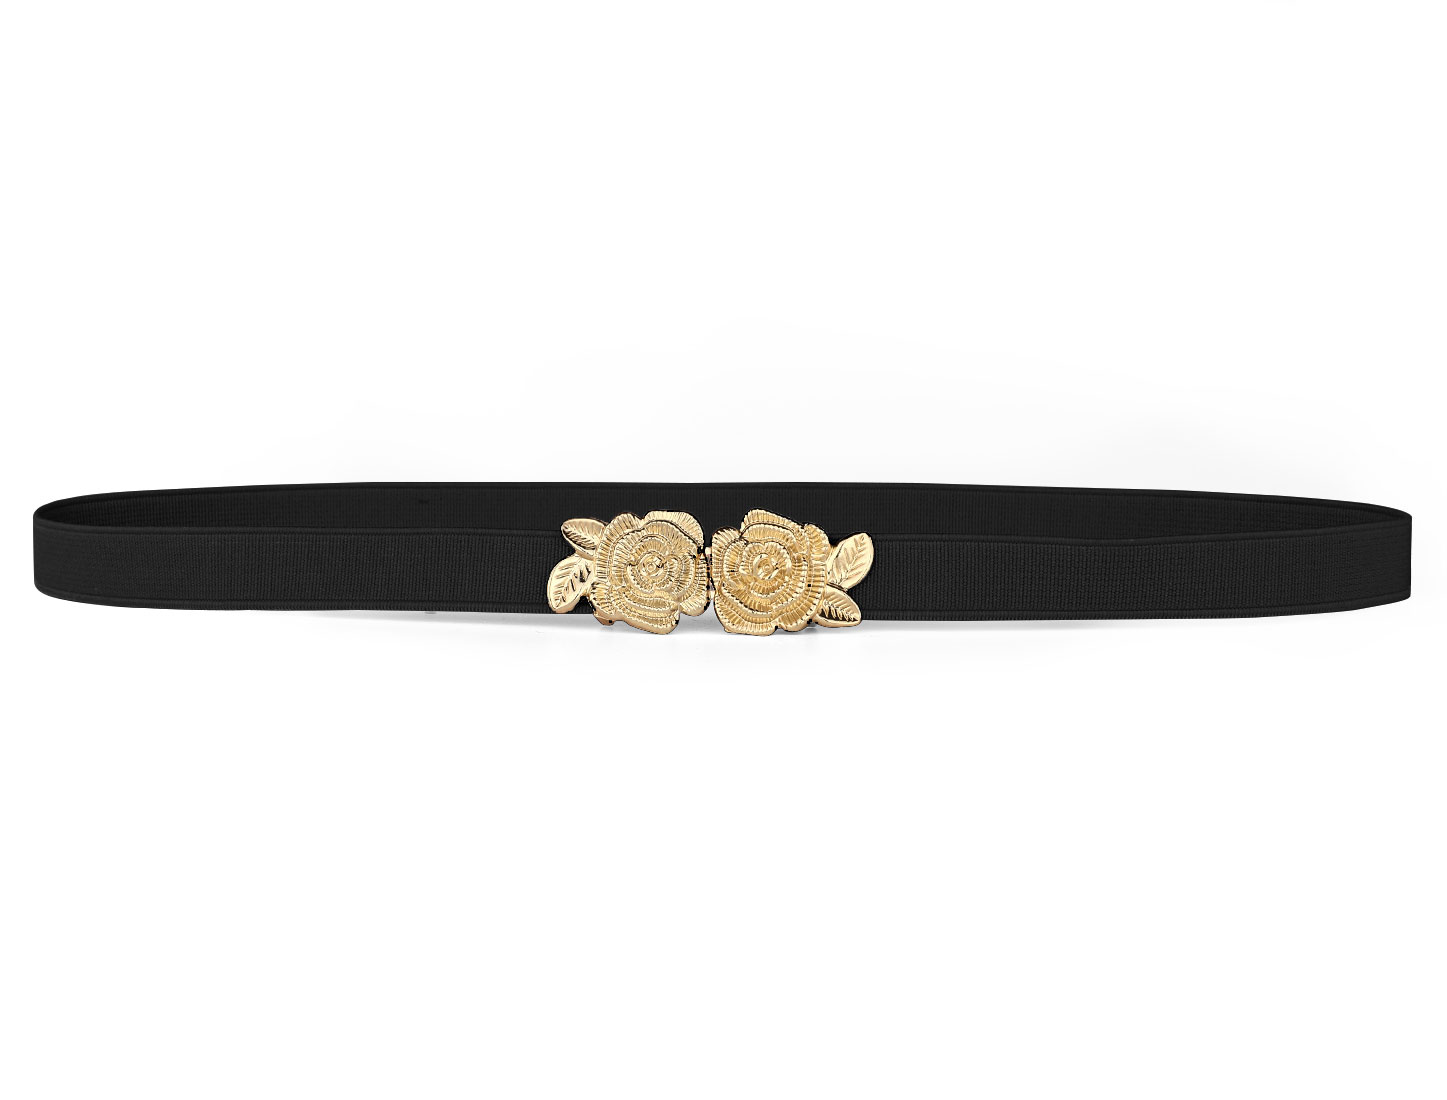 Lady Flower Shape Interlocking Buckle Elastic Band Waist Cinch Belt Black